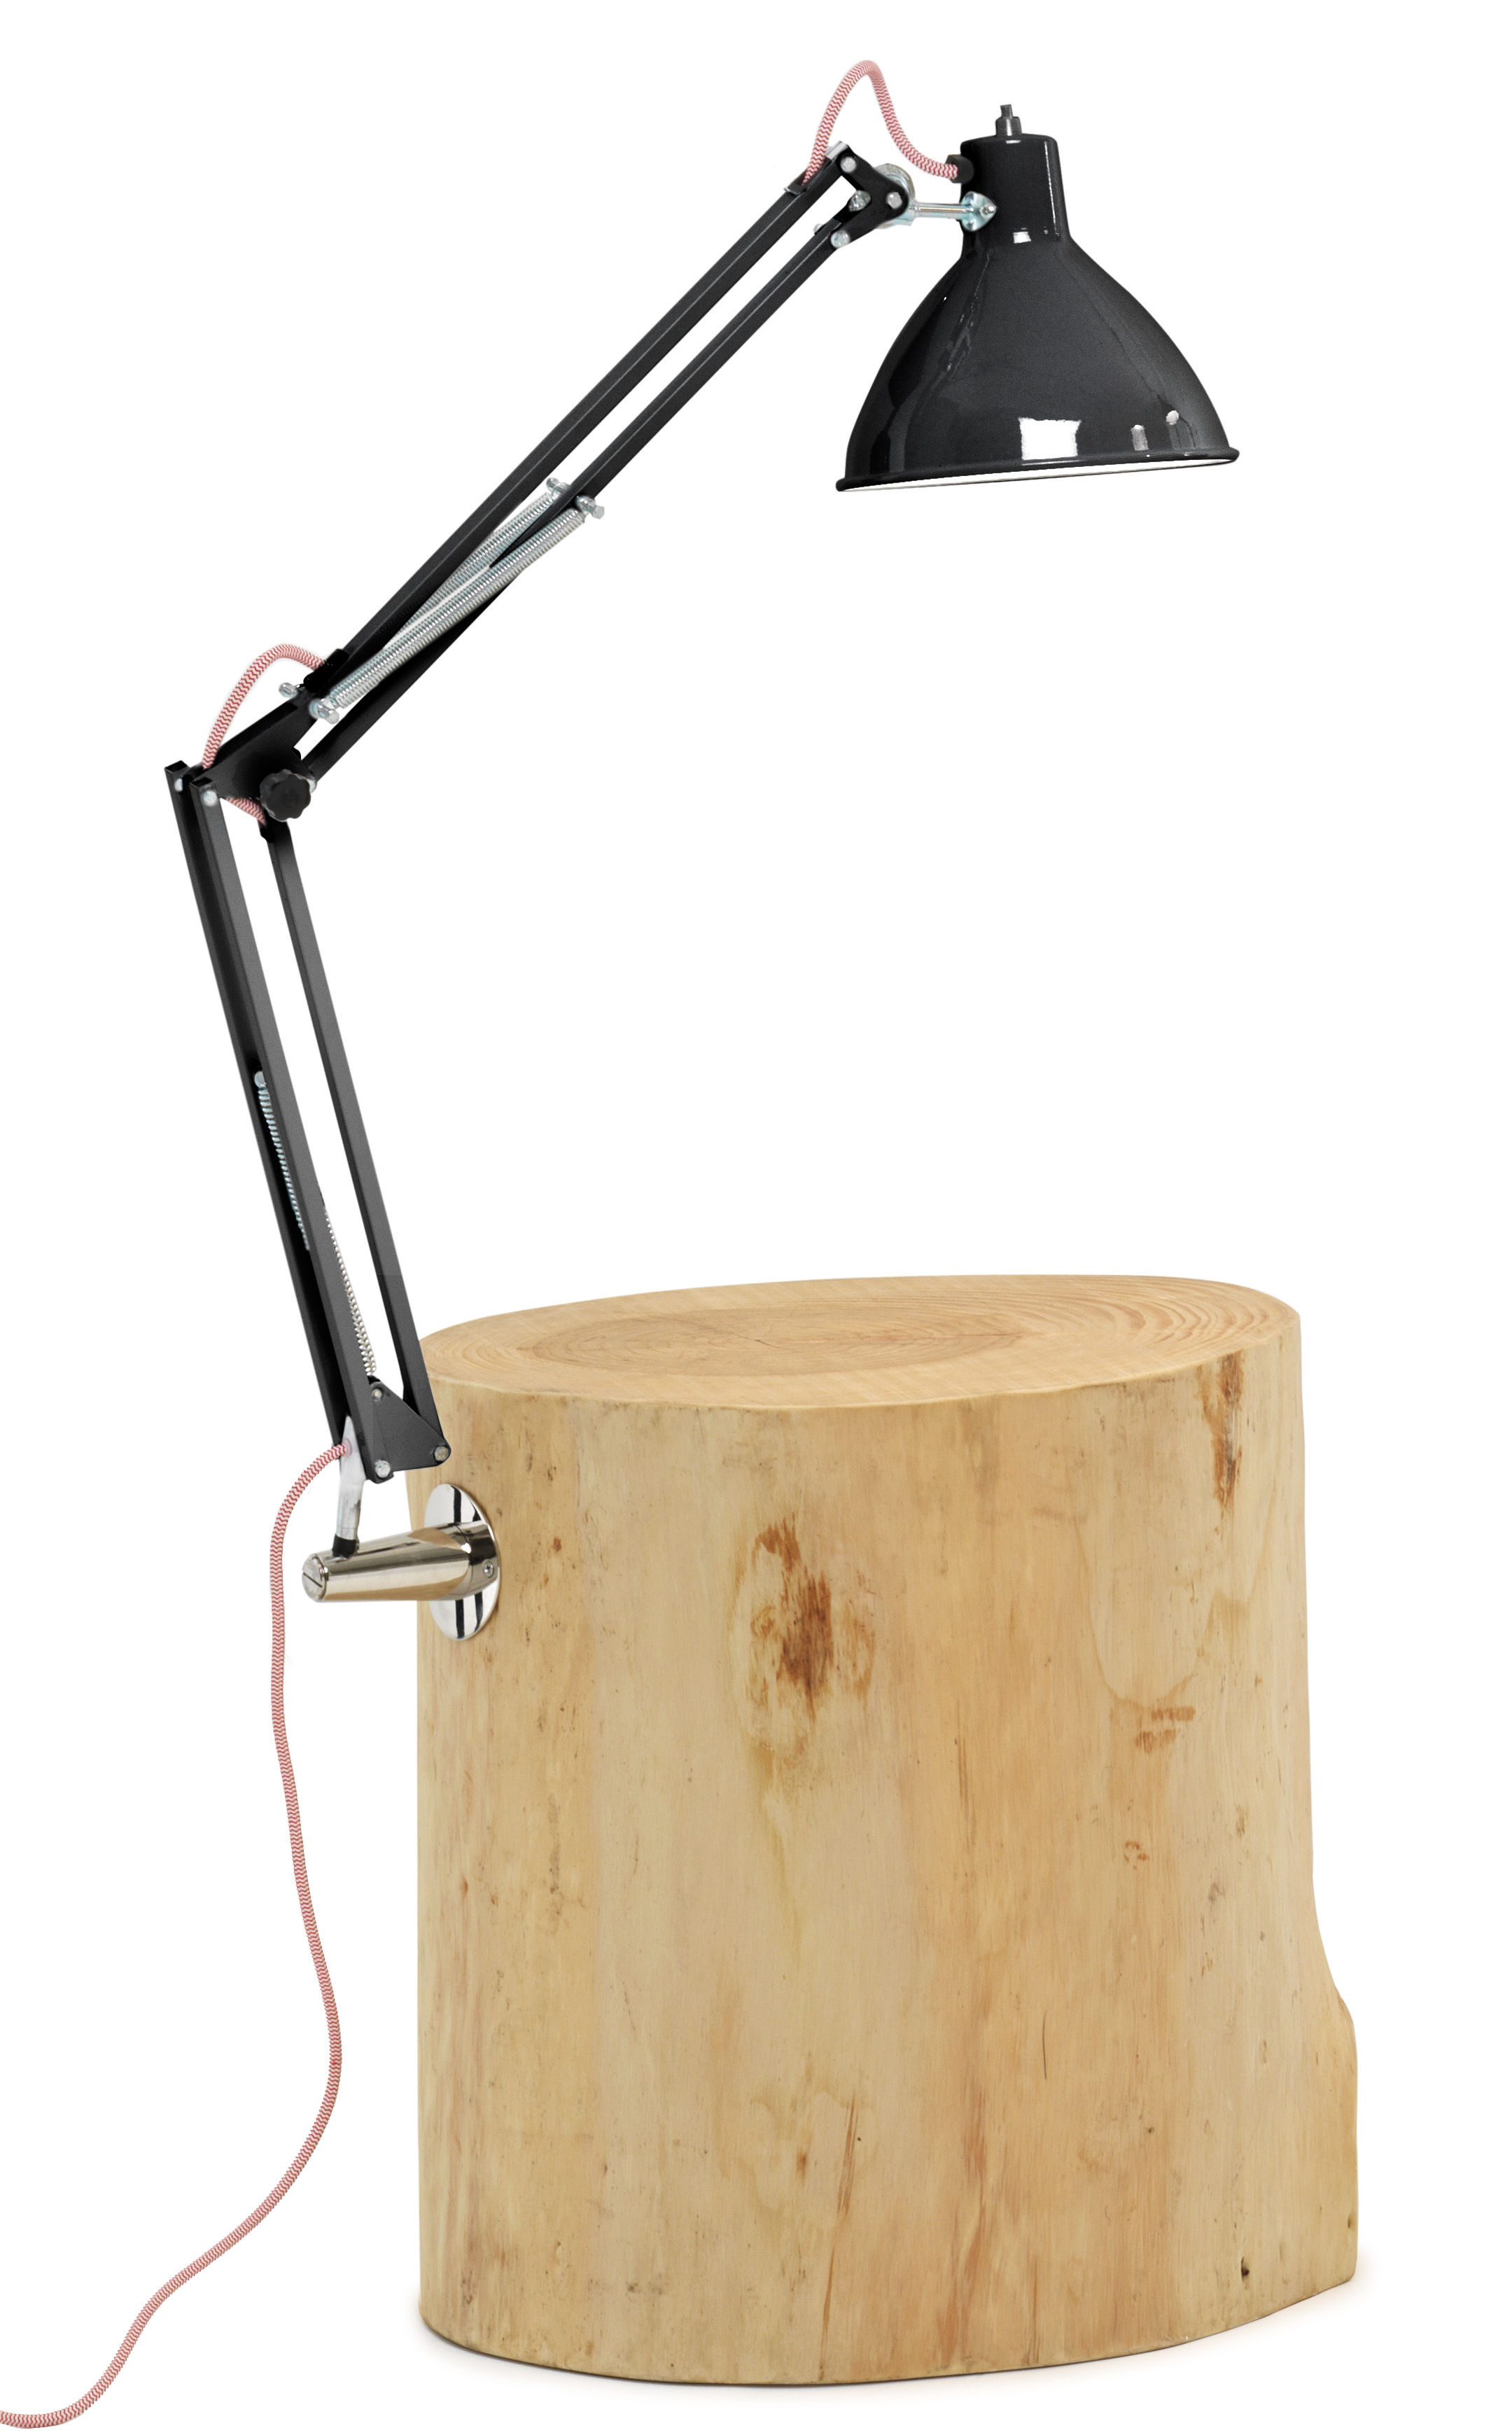 table d 39 appoint piantama h 50 cm avec lampe bois lampe noire mogg made in design. Black Bedroom Furniture Sets. Home Design Ideas